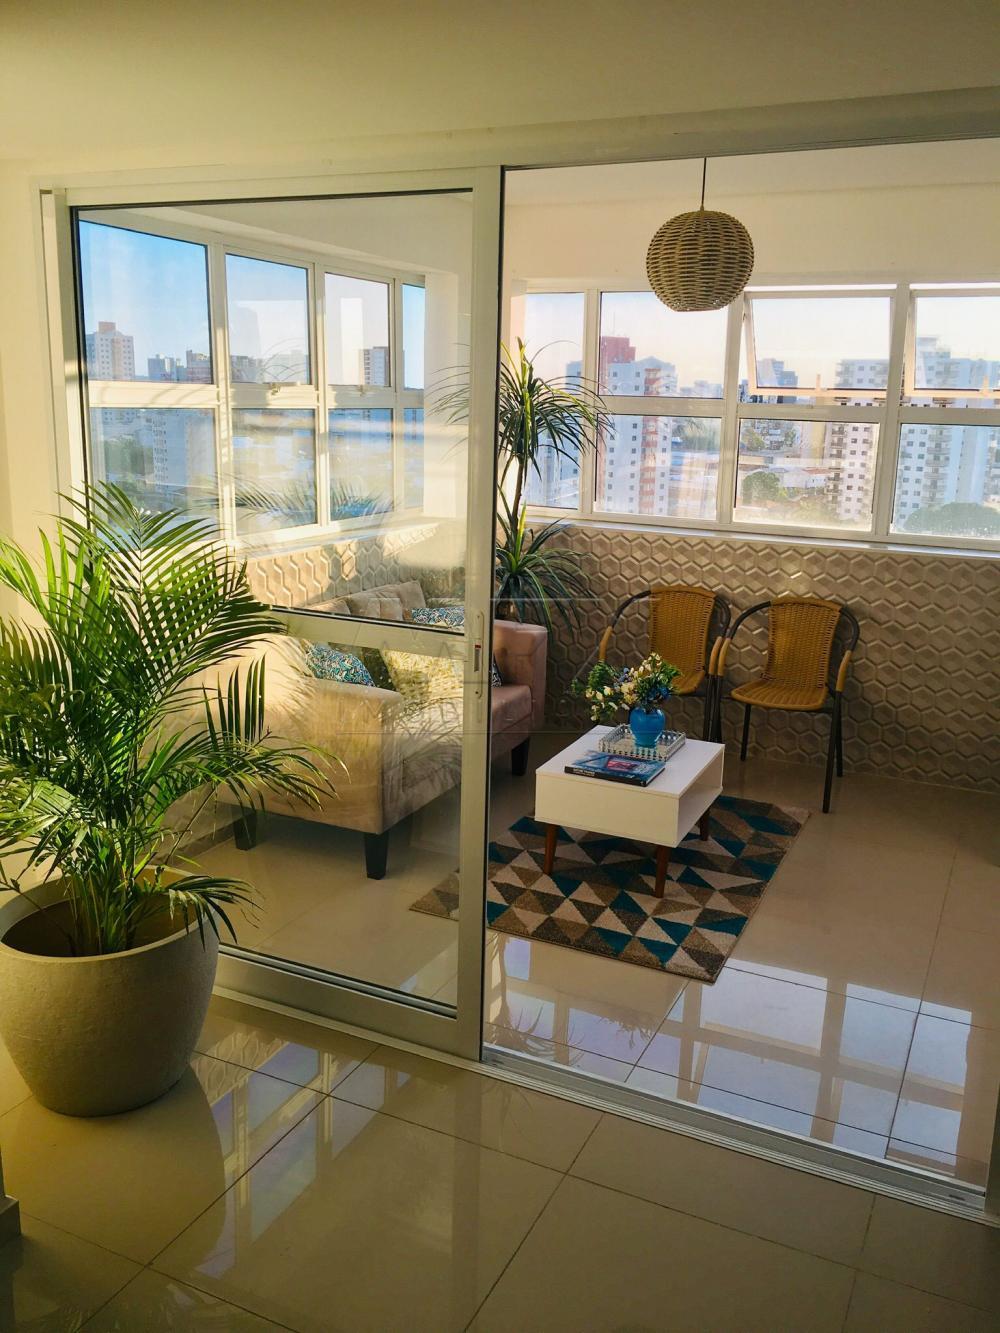 Comprar Apartamento / Duplex em Bauru R$ 700.000,00 - Foto 3